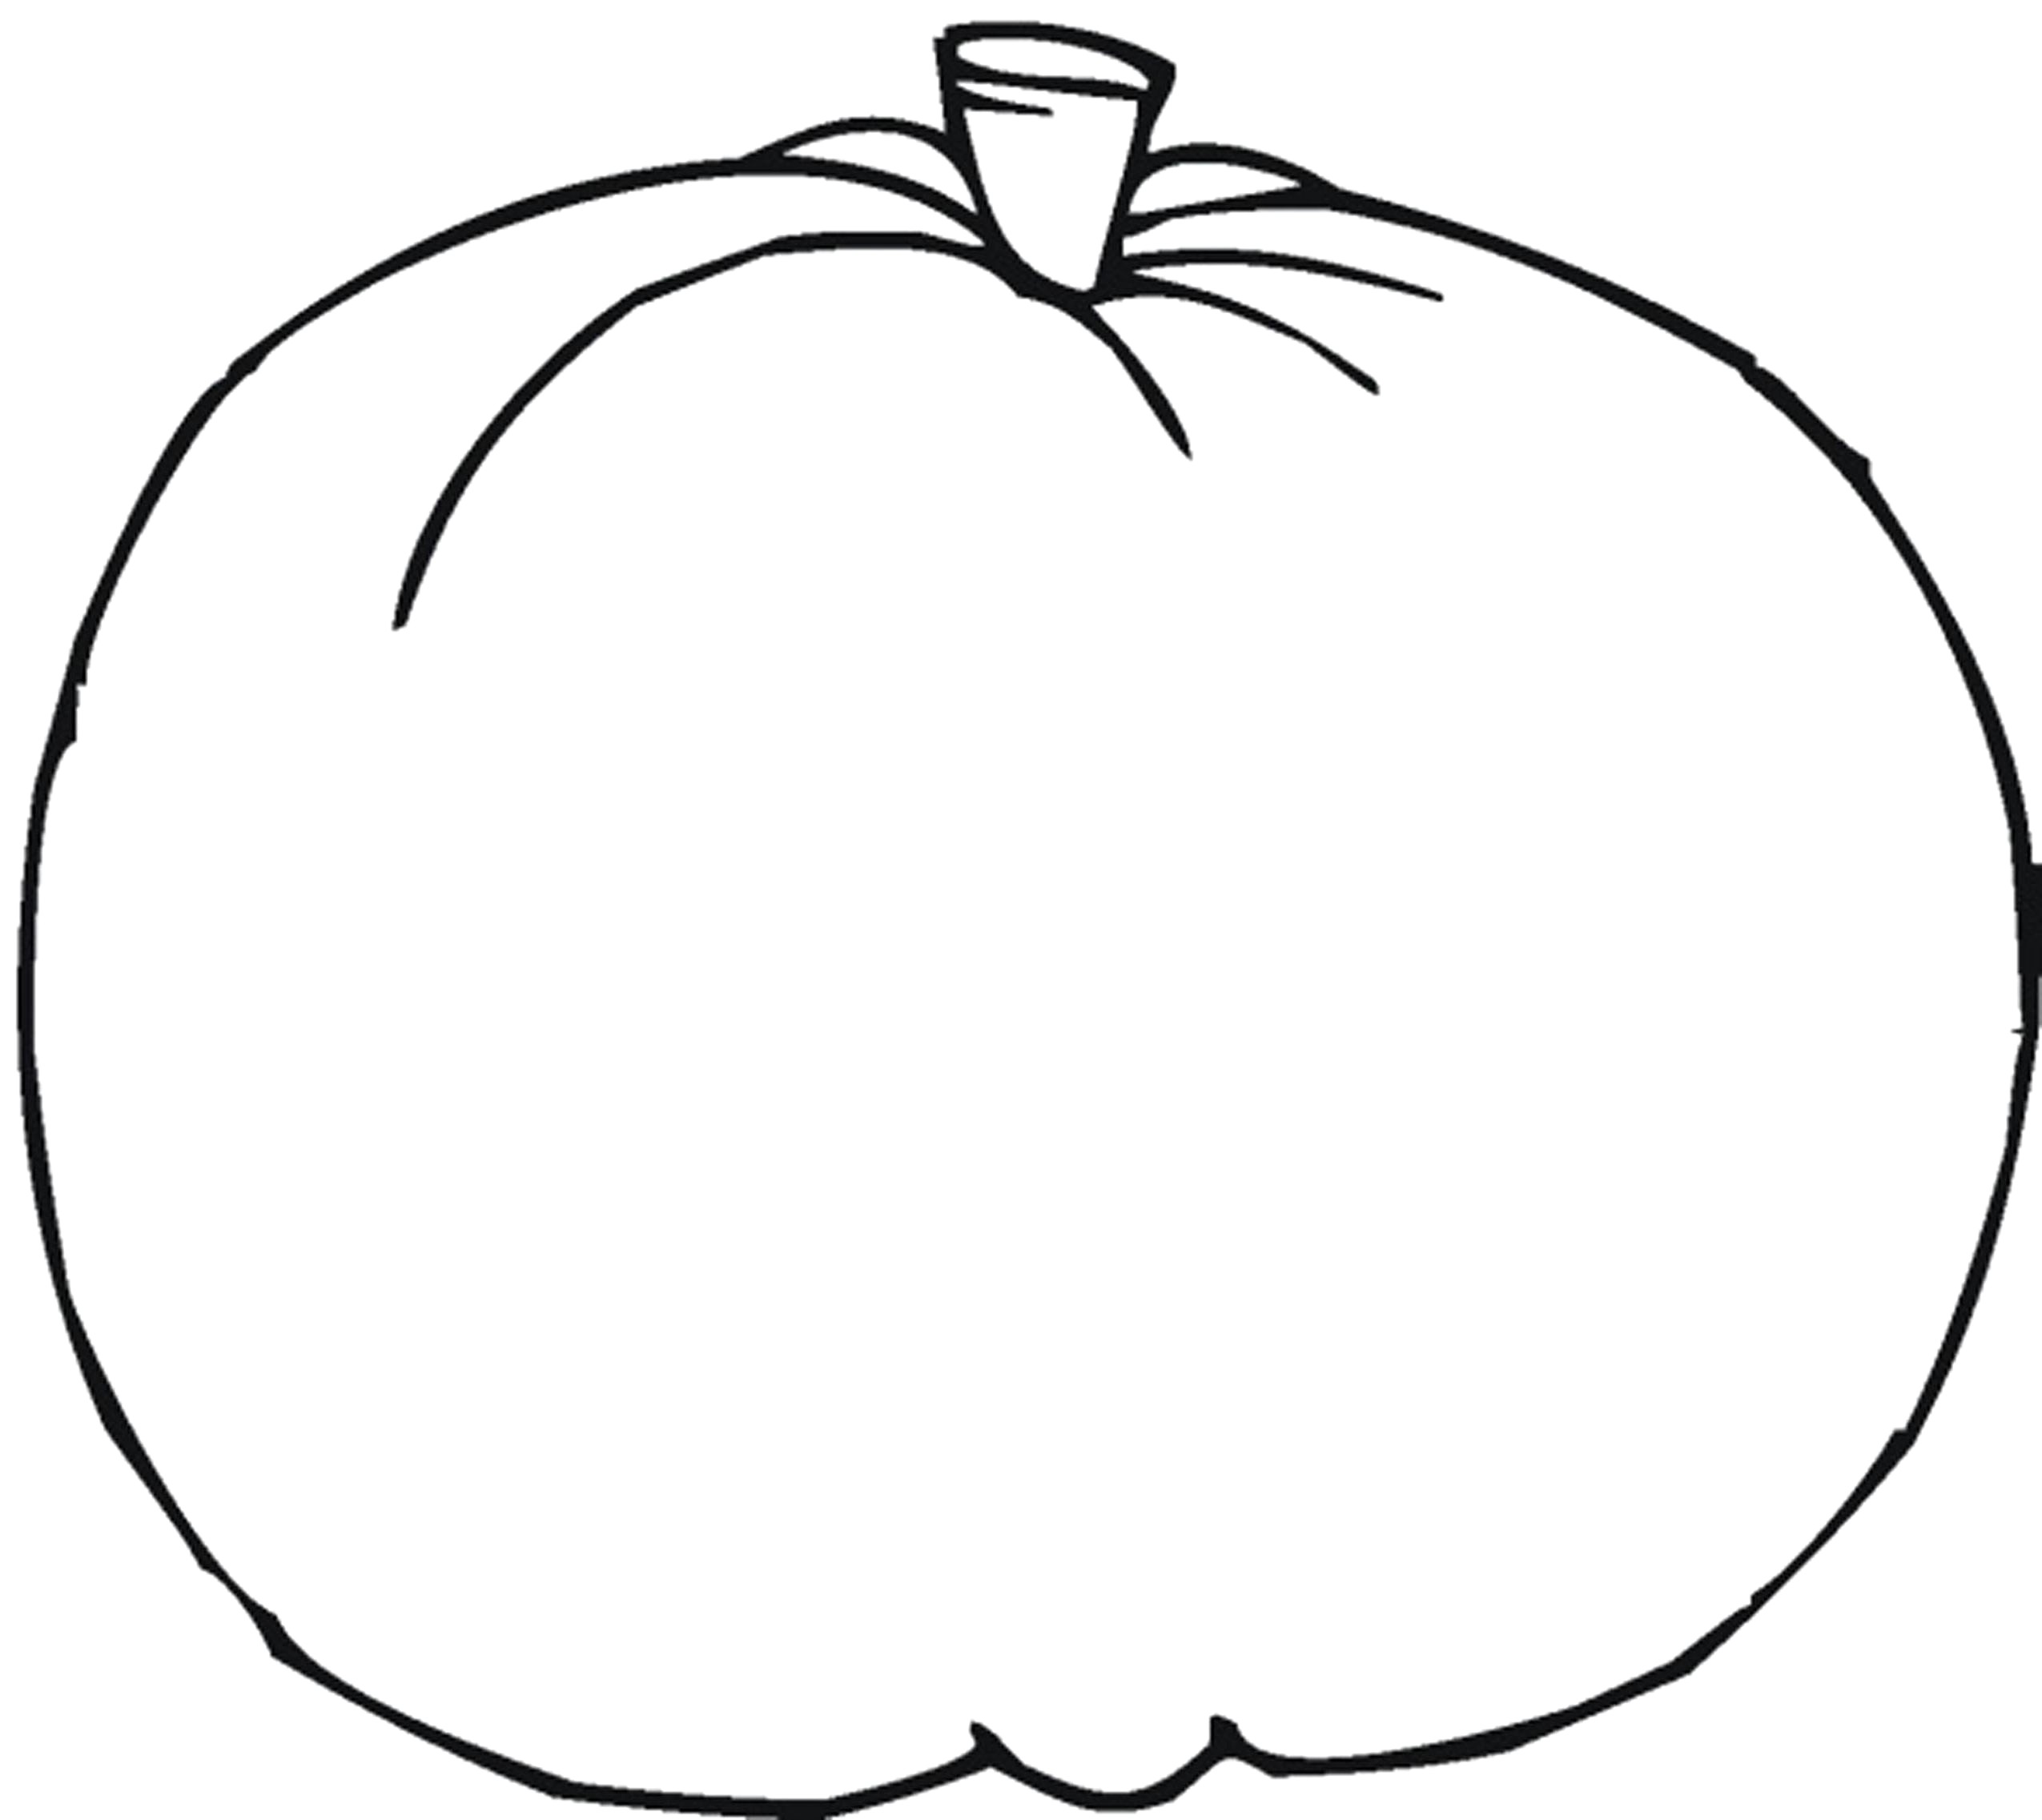 Pumpkin Drawing Images